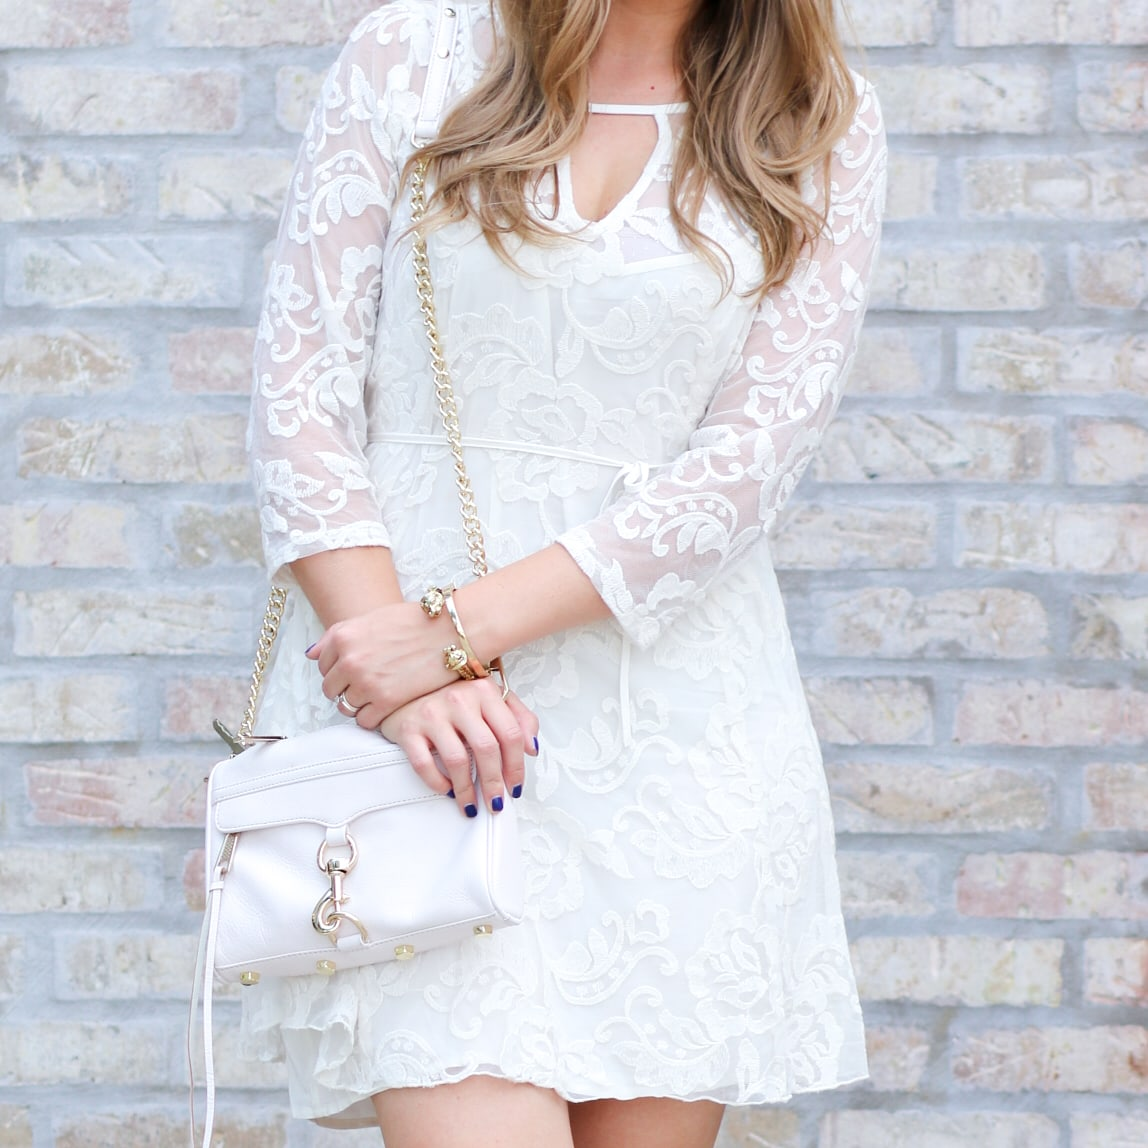 hollister-white-dress-ashley-brooke-nicholas-3927-2